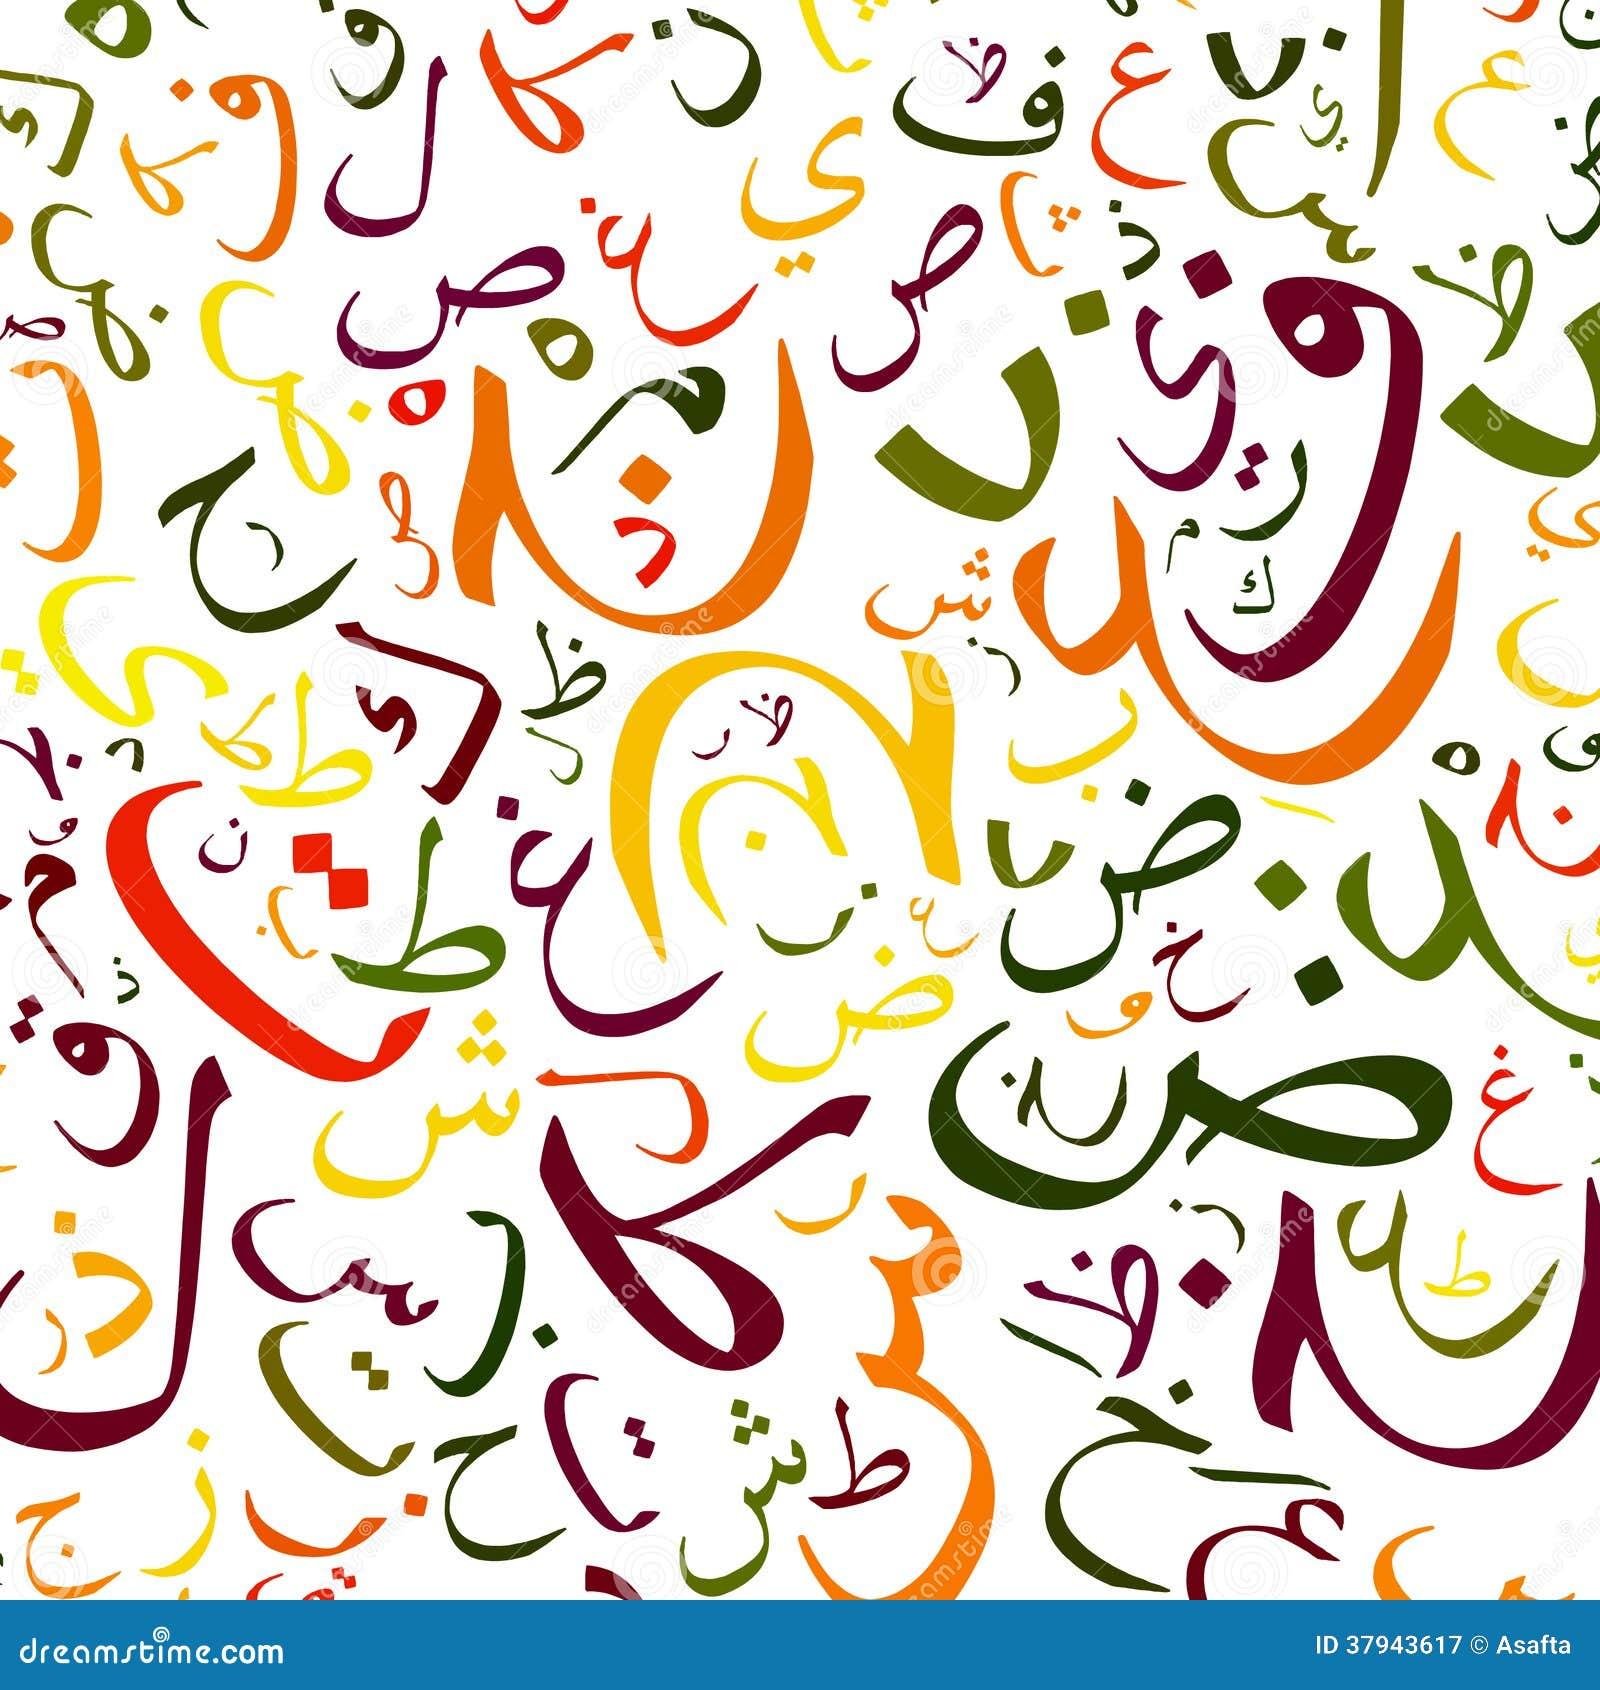 Arabic Letters Arabic alphabet background